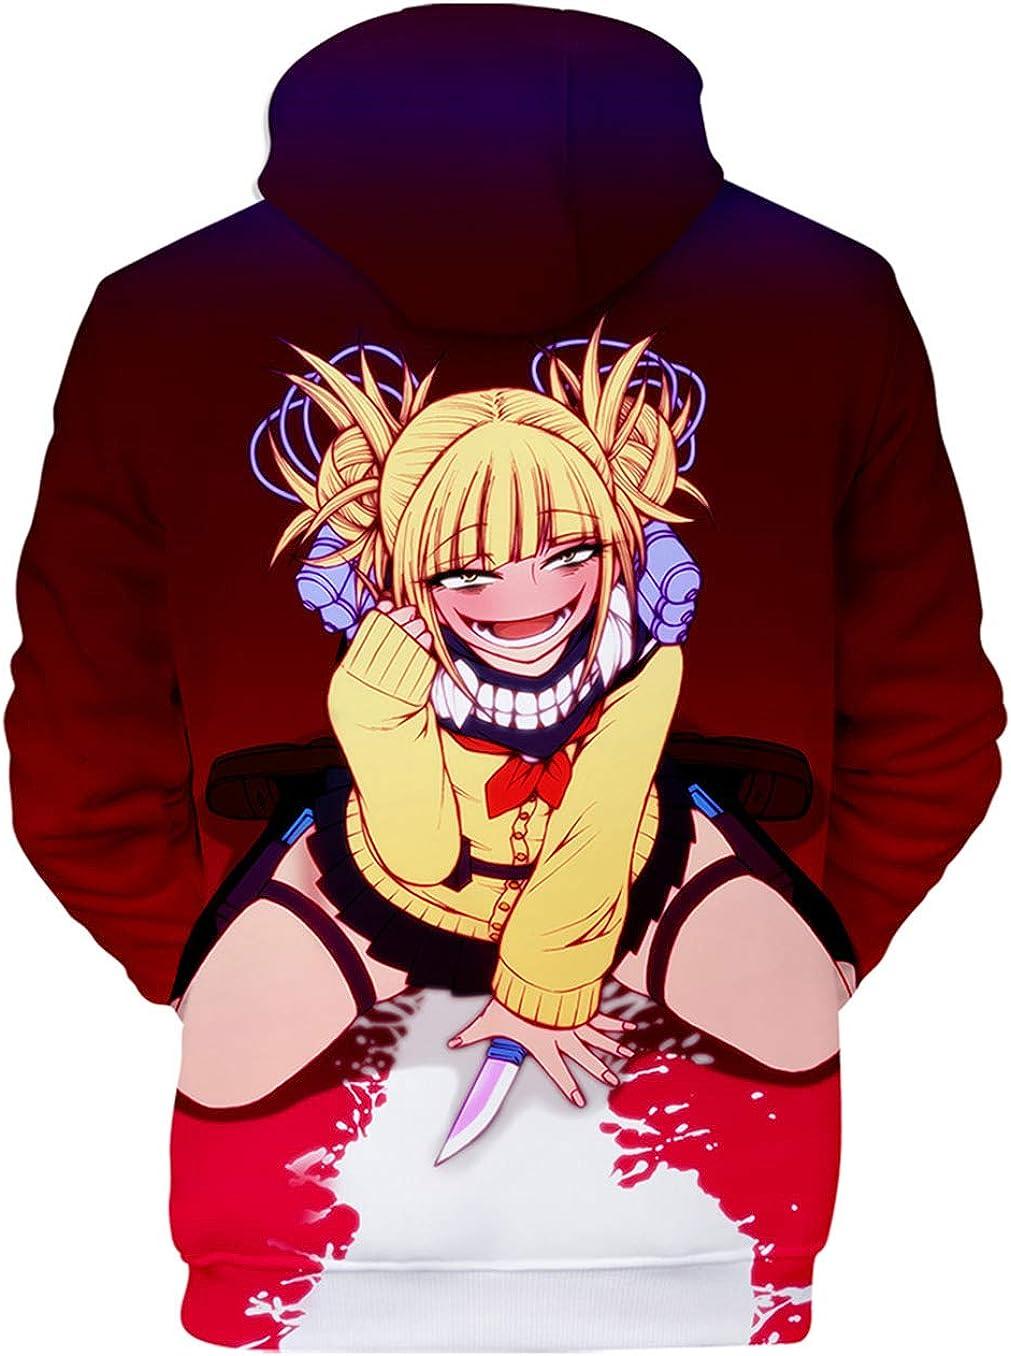 HAOSHENG Femme Homme 3D Sweats /à Capuche My Hero Academia Boku No Hero Academia Manga Cosplay Unisexe Japonais Pullover